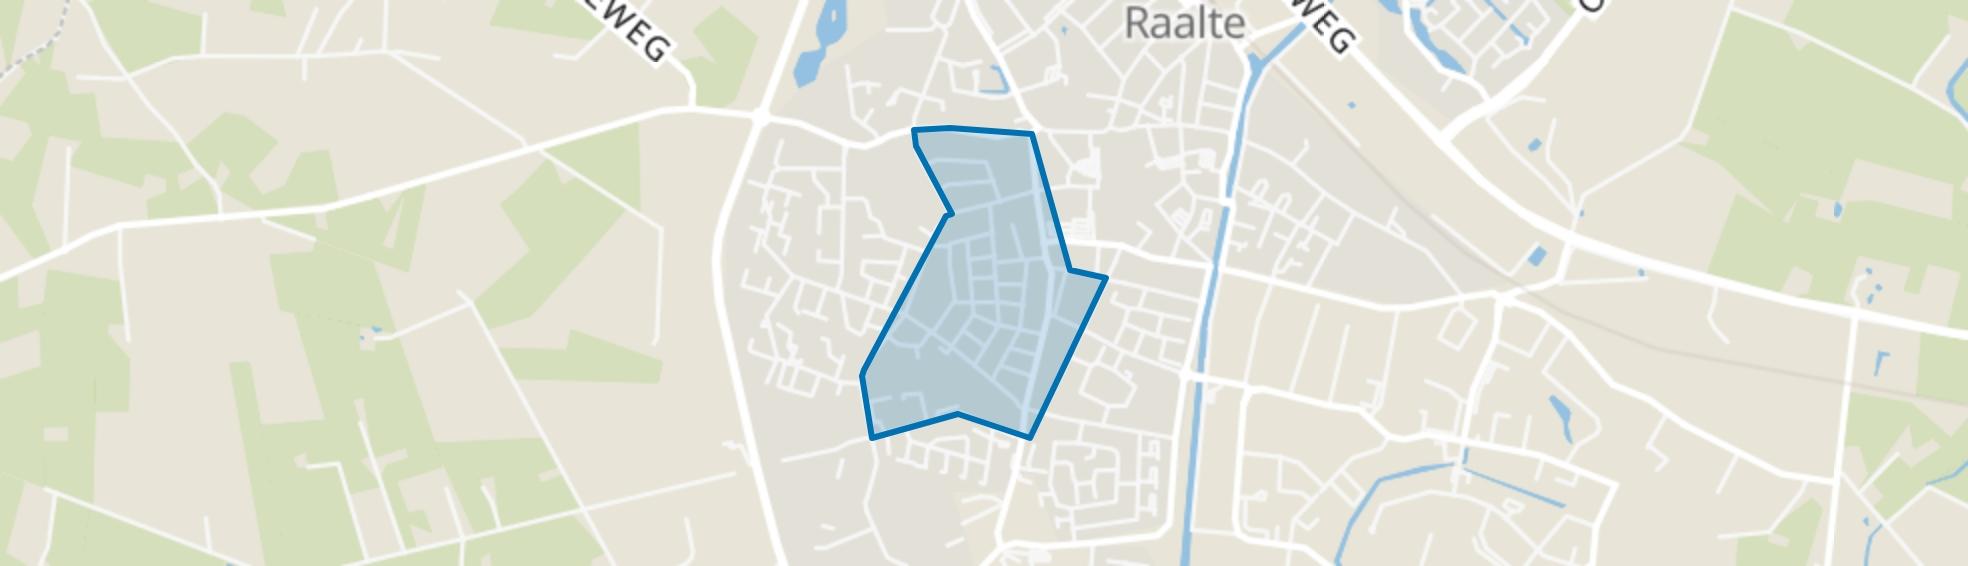 Westdorp, Raalte map